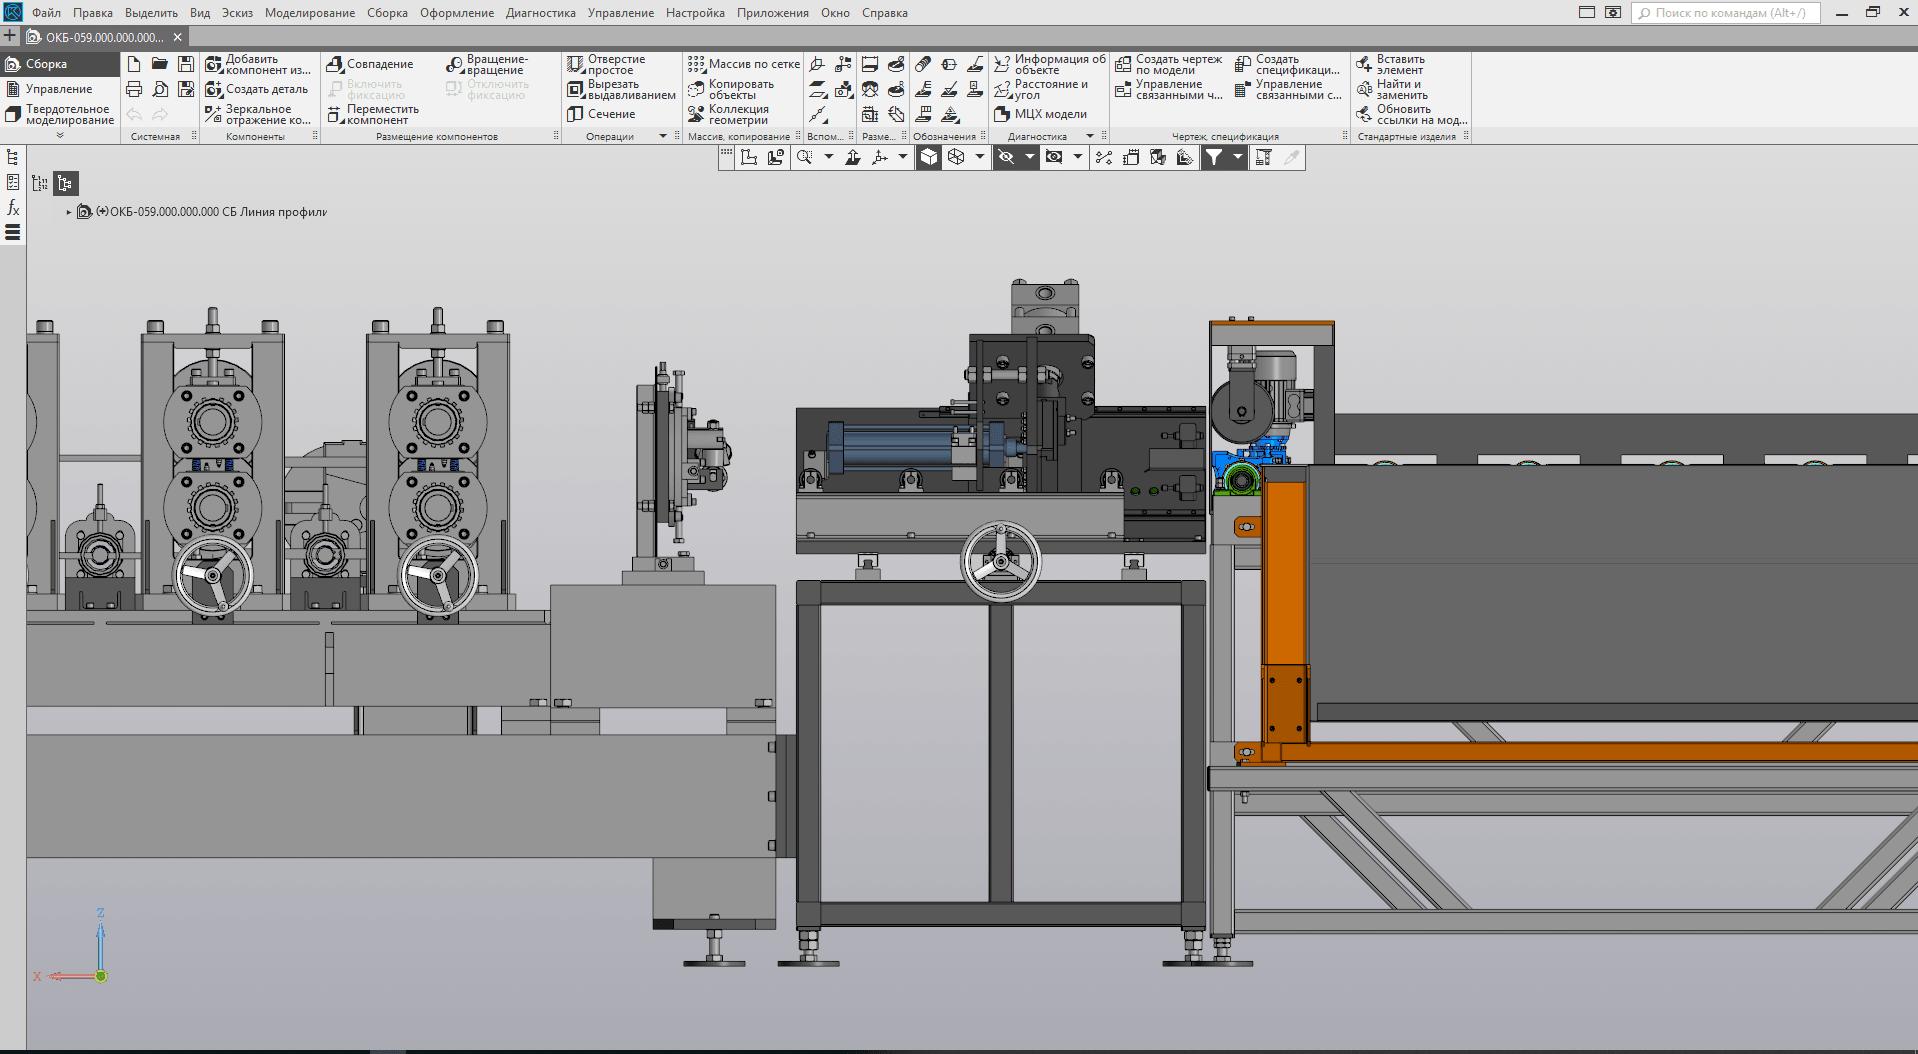 2807106-compressor